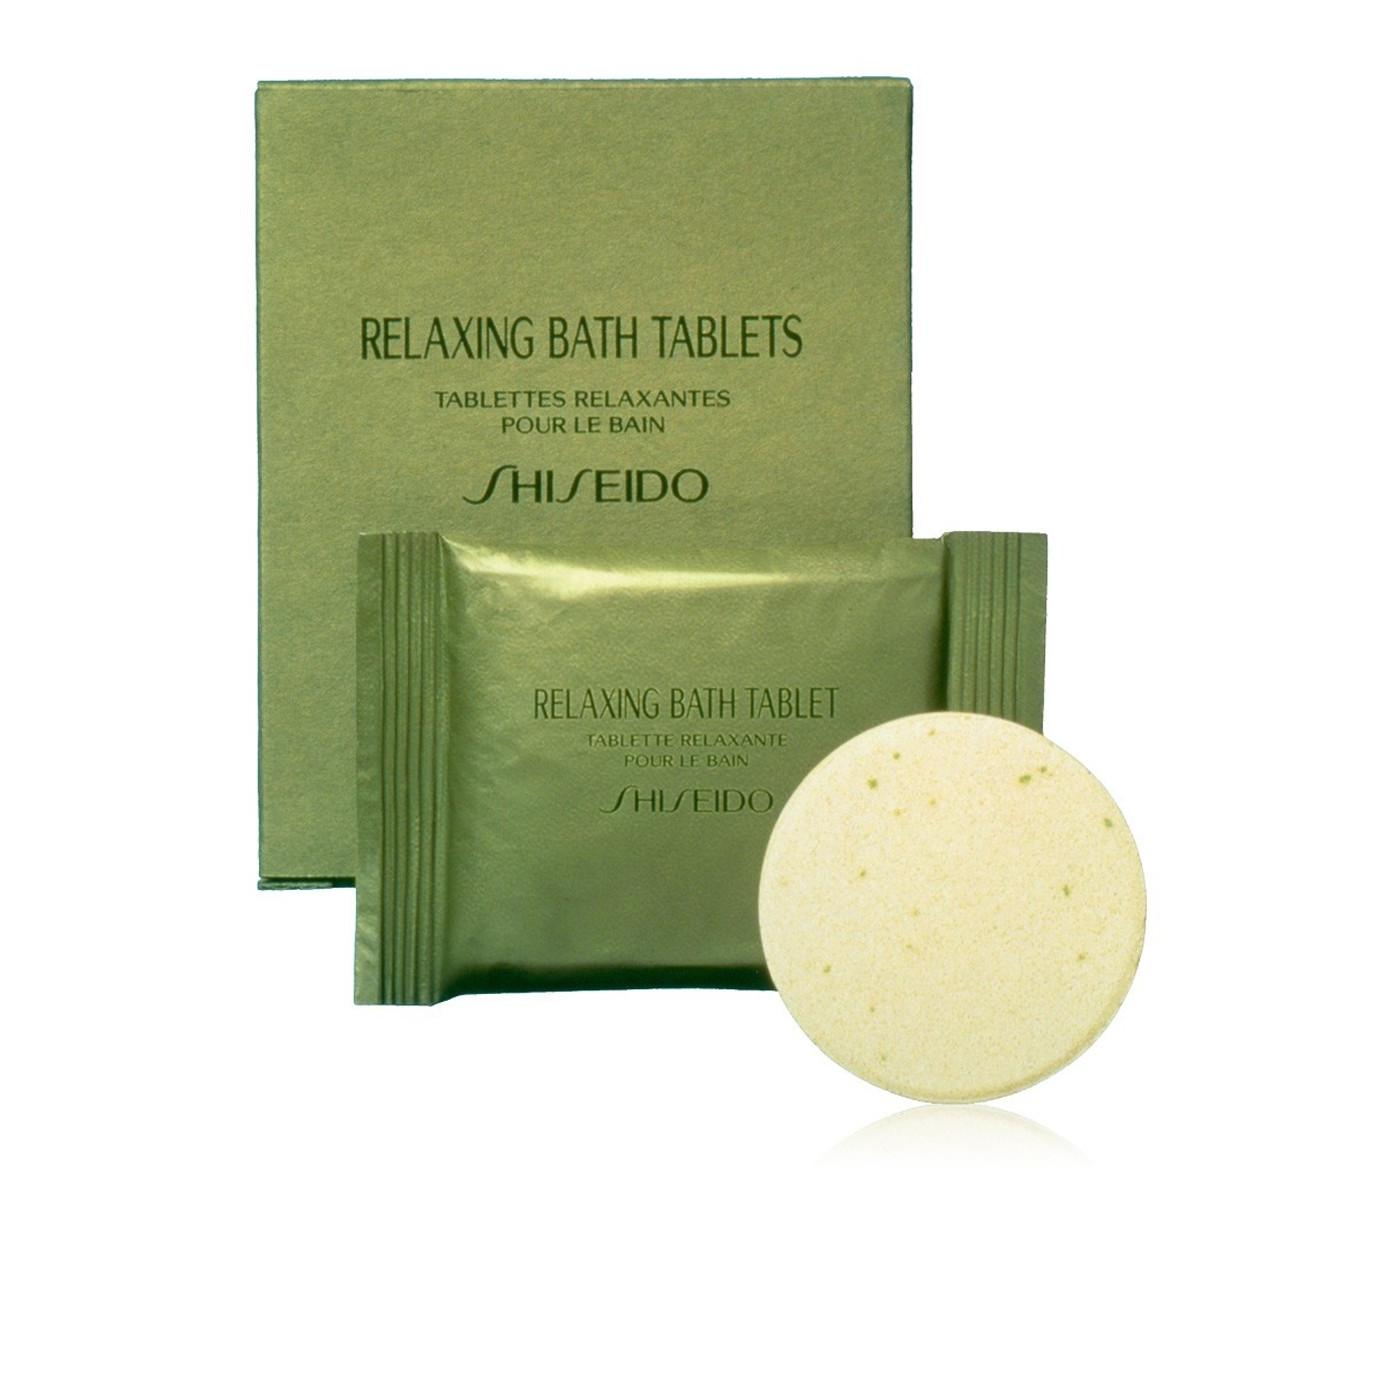 RELAXING BATH TABLETS 8 PZ COMPRESSE EFFERVESCENTI BAGNO RILASSANTI